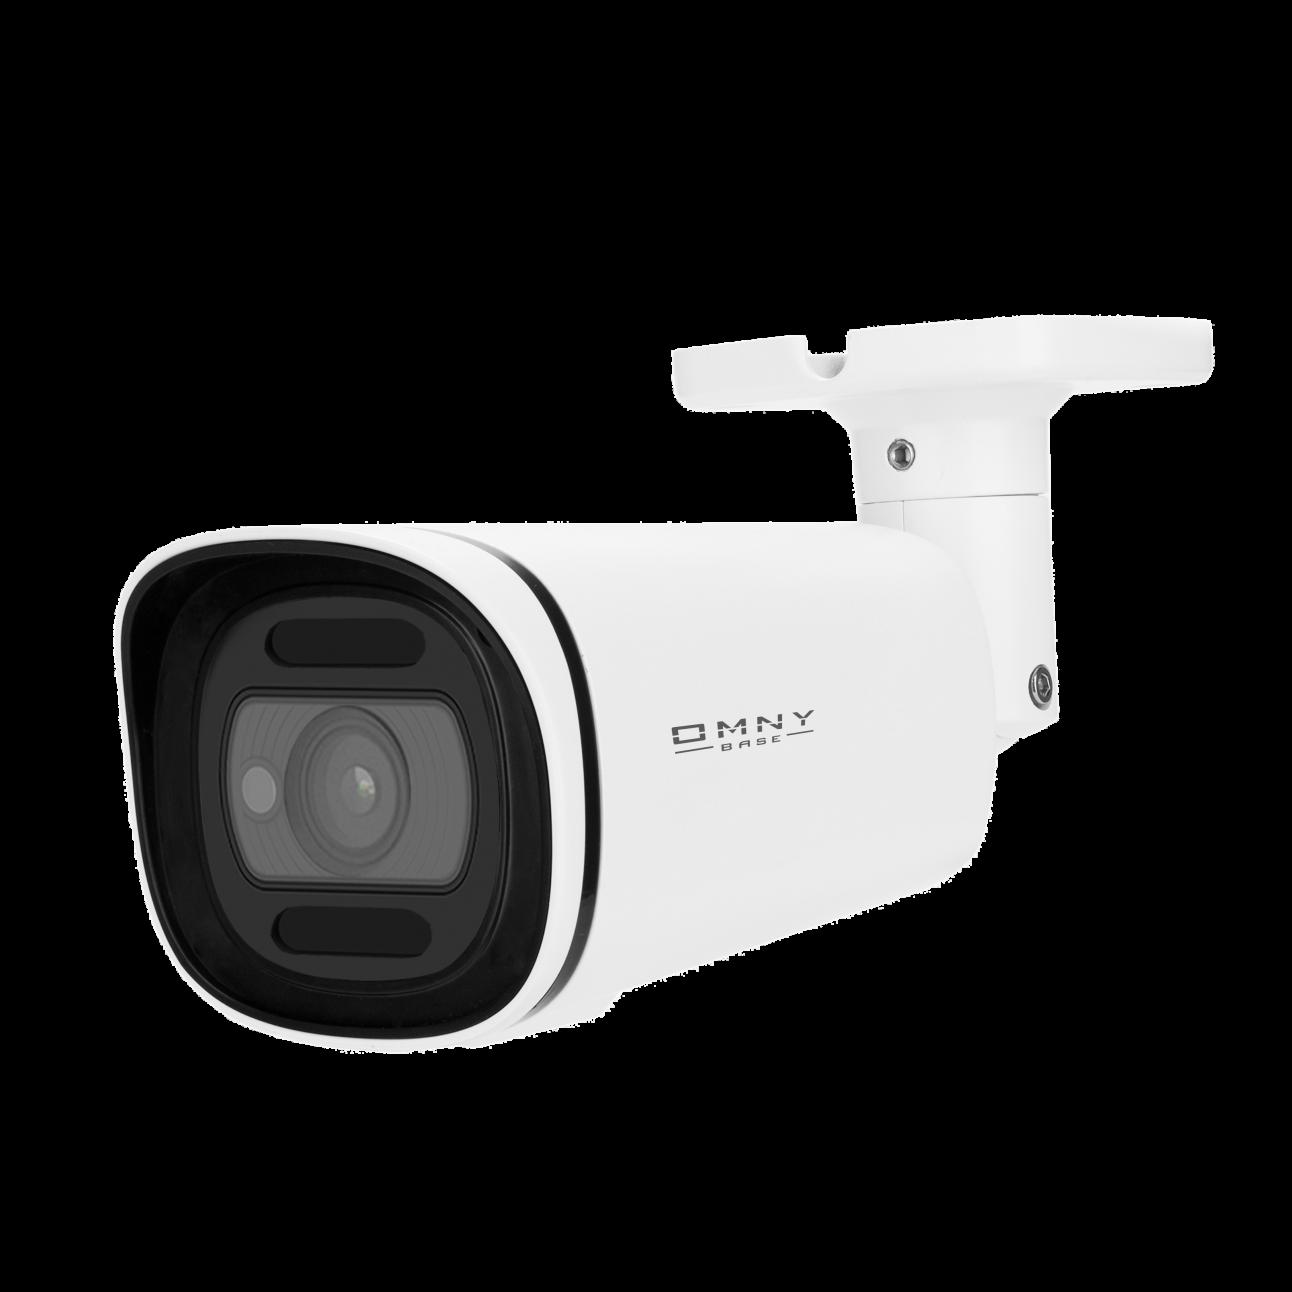 IP камера OMNY ViBe2EZ-WDU 27135 серии BASE, буллет, 1920x1080 30кс, 2.7-13.5мм моторизованный, EasyMic, 12В DC; 802.3af, ИК до 50м, WDR 120dB, USB2.0